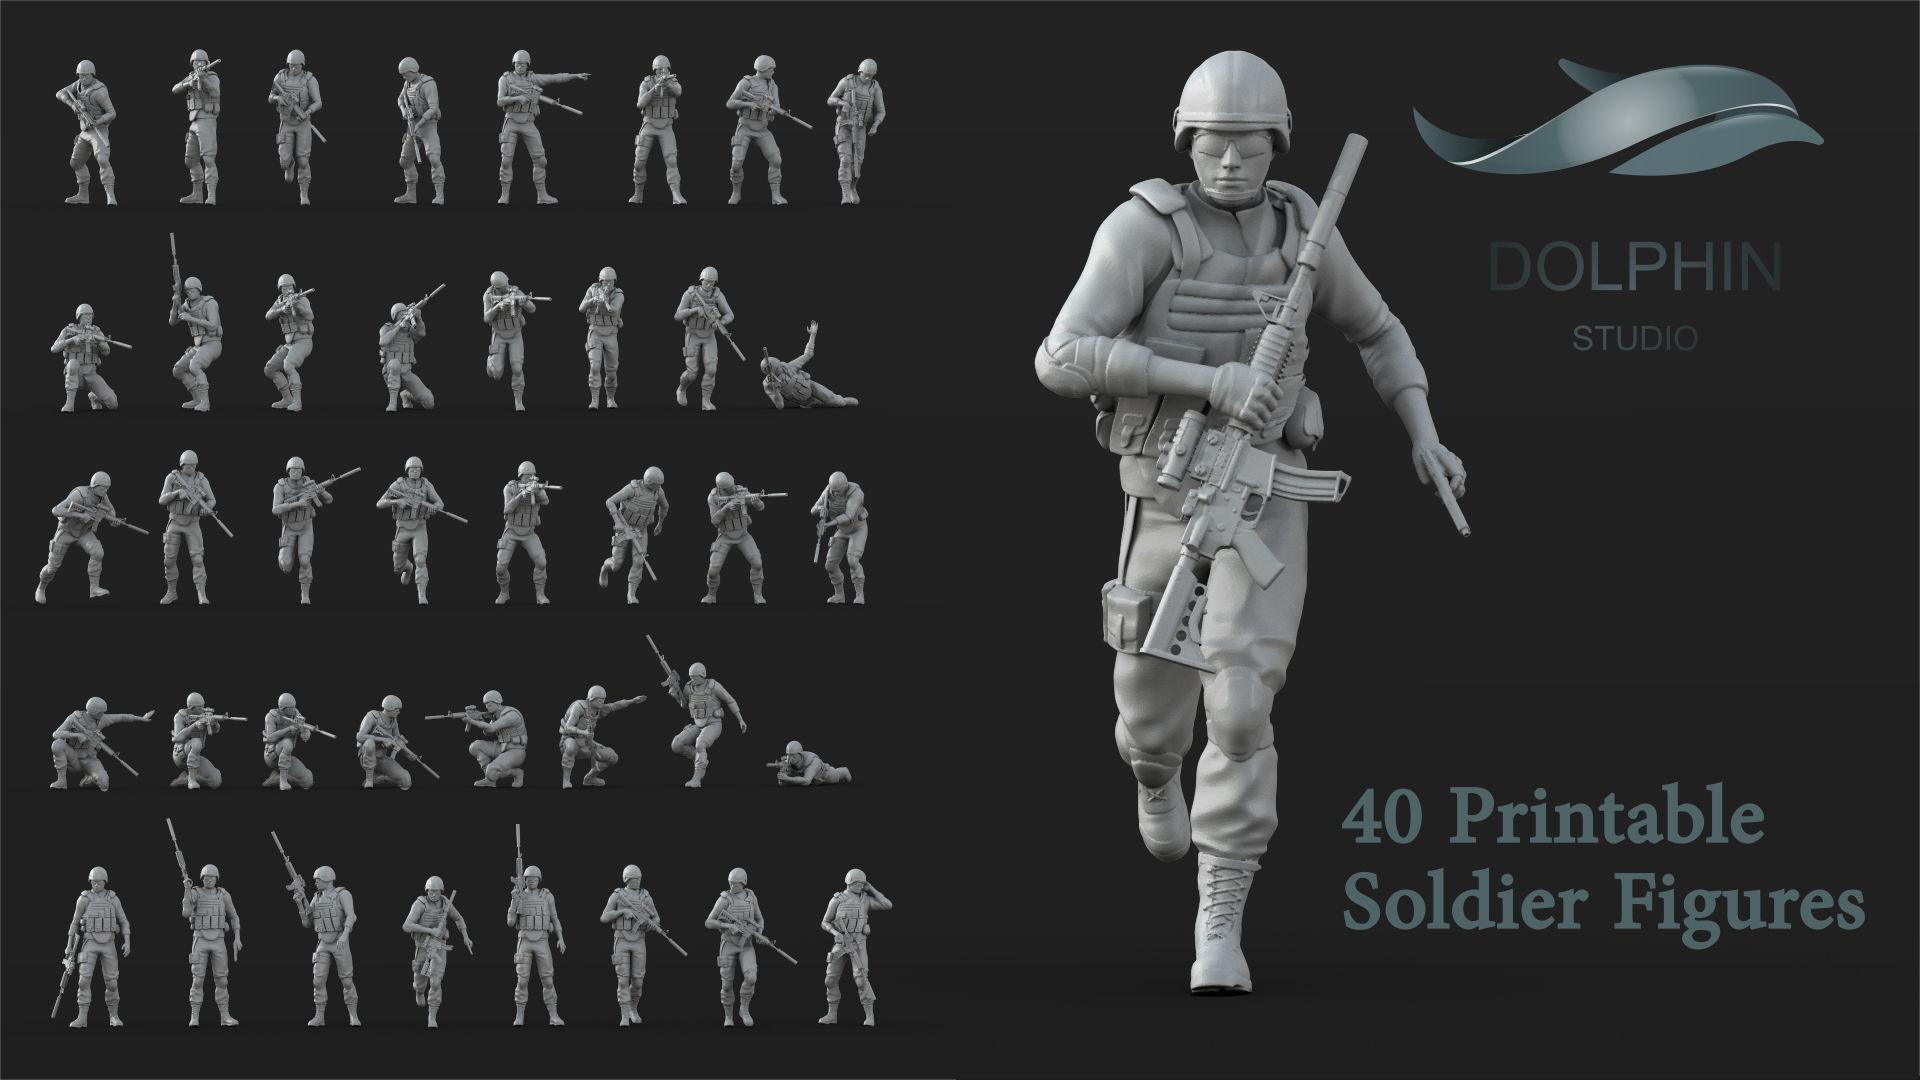 40 US Marines Soldier figures